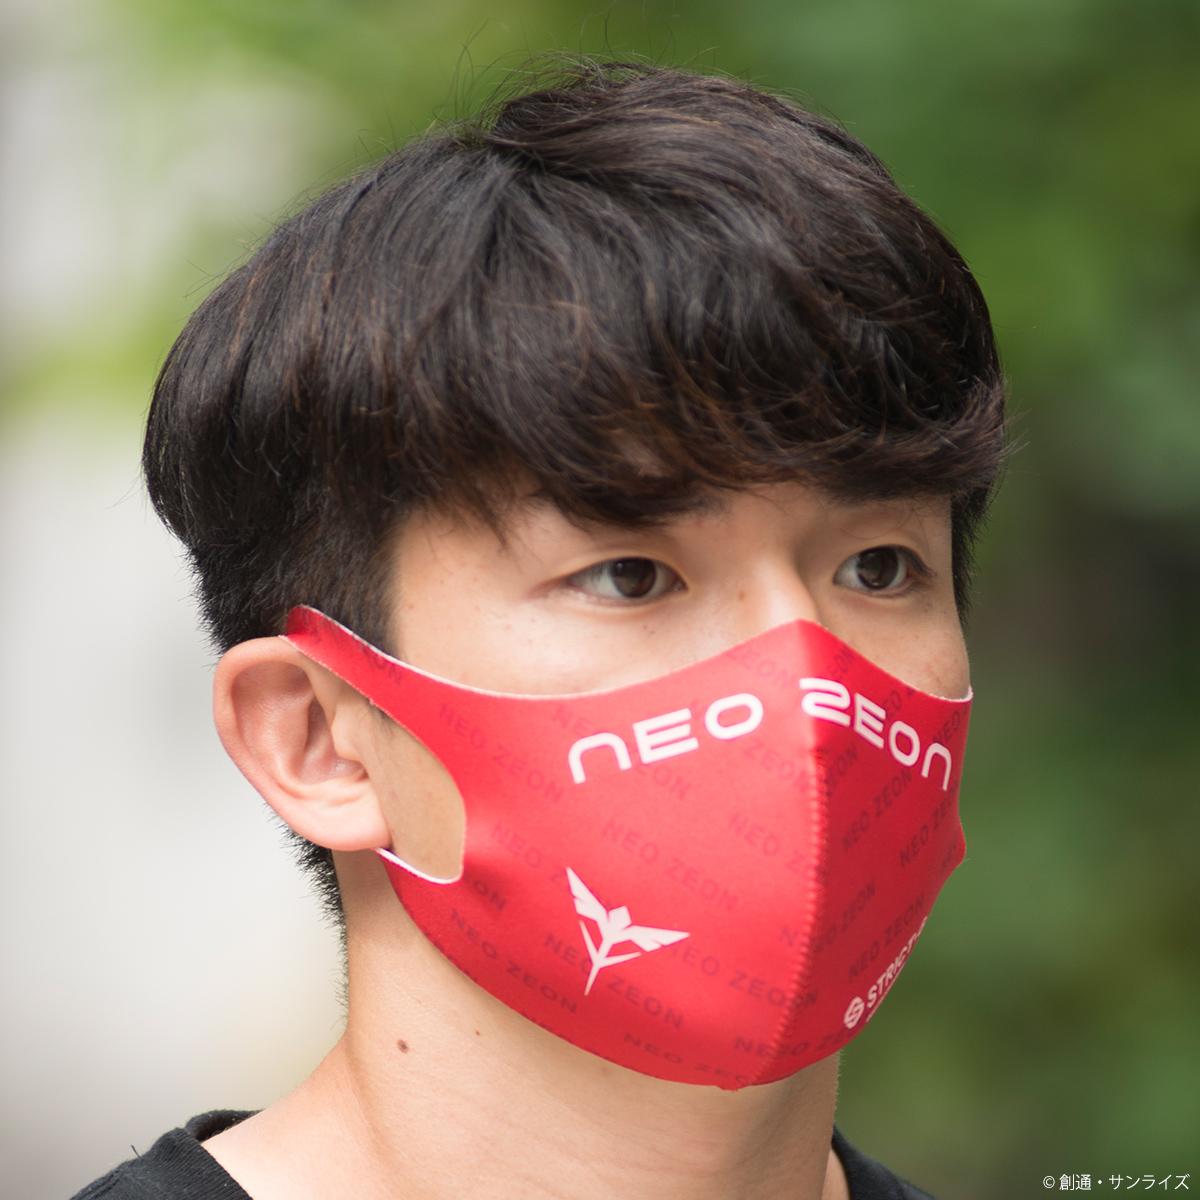 STRICT-G『機動戦士Zガンダム』 フェイスカバー NEO ZEON柄